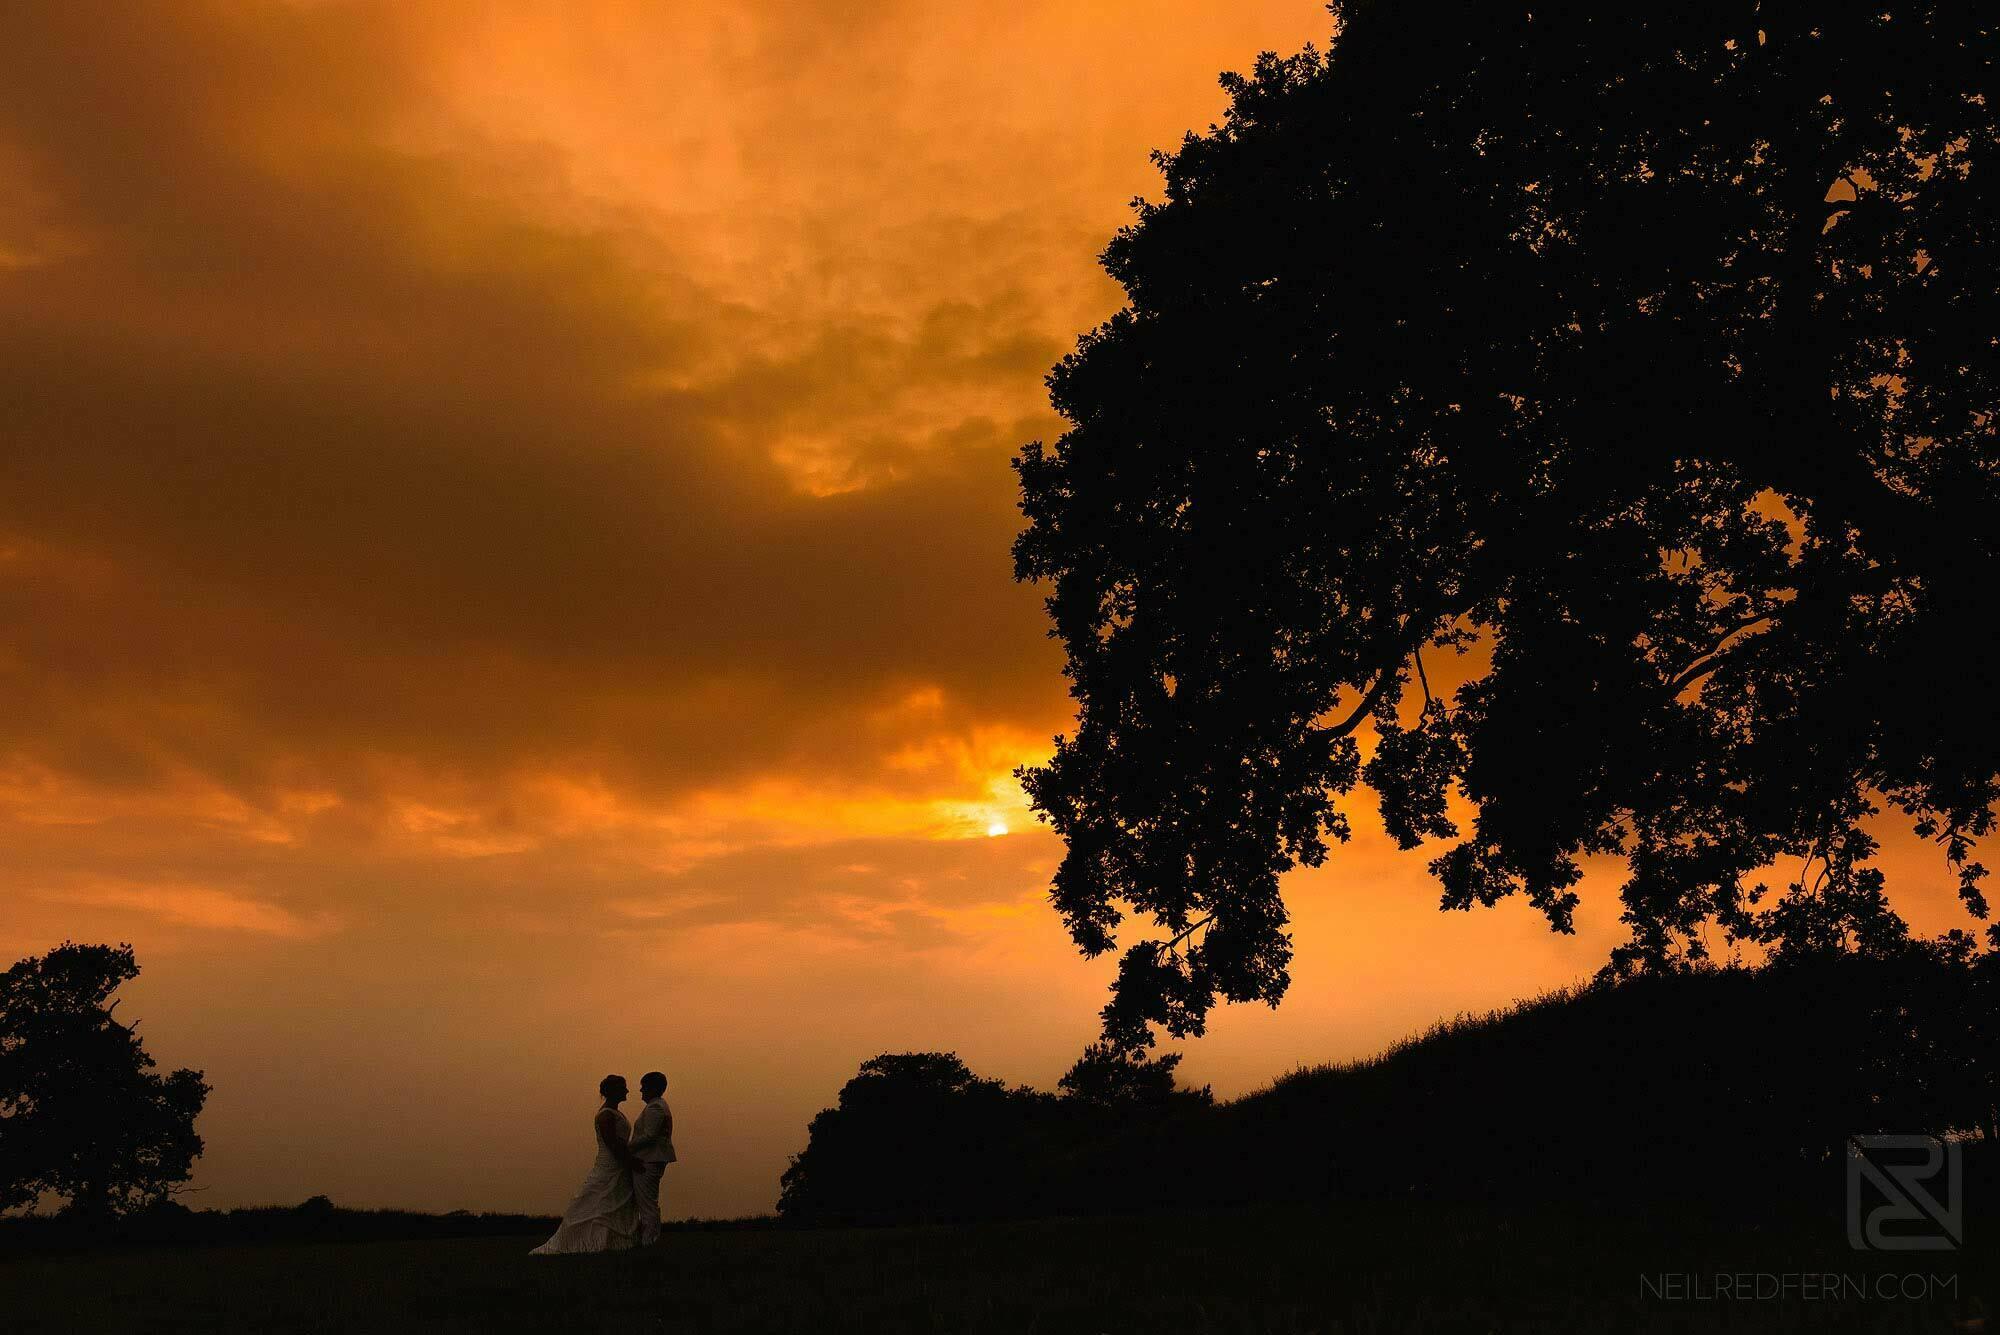 sunset photograph at Sandhole Oak Barn